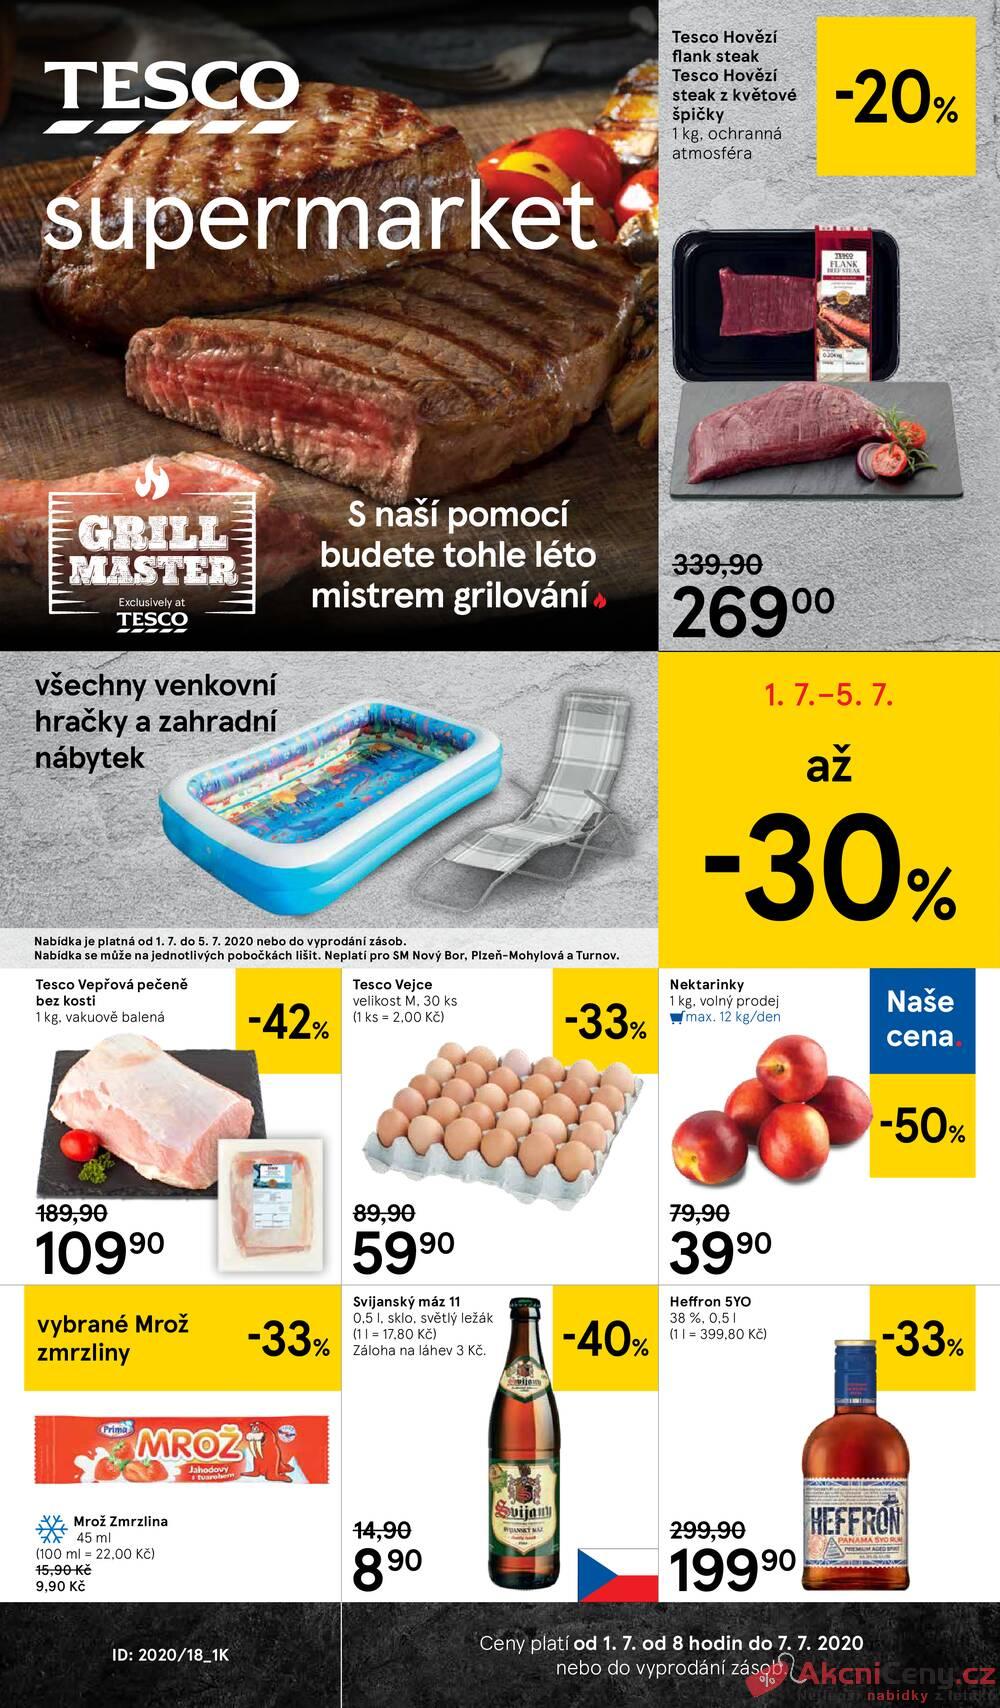 Leták Tesco - Tesco supermarkety od 1.7. do 7.7.2020 - strana 1